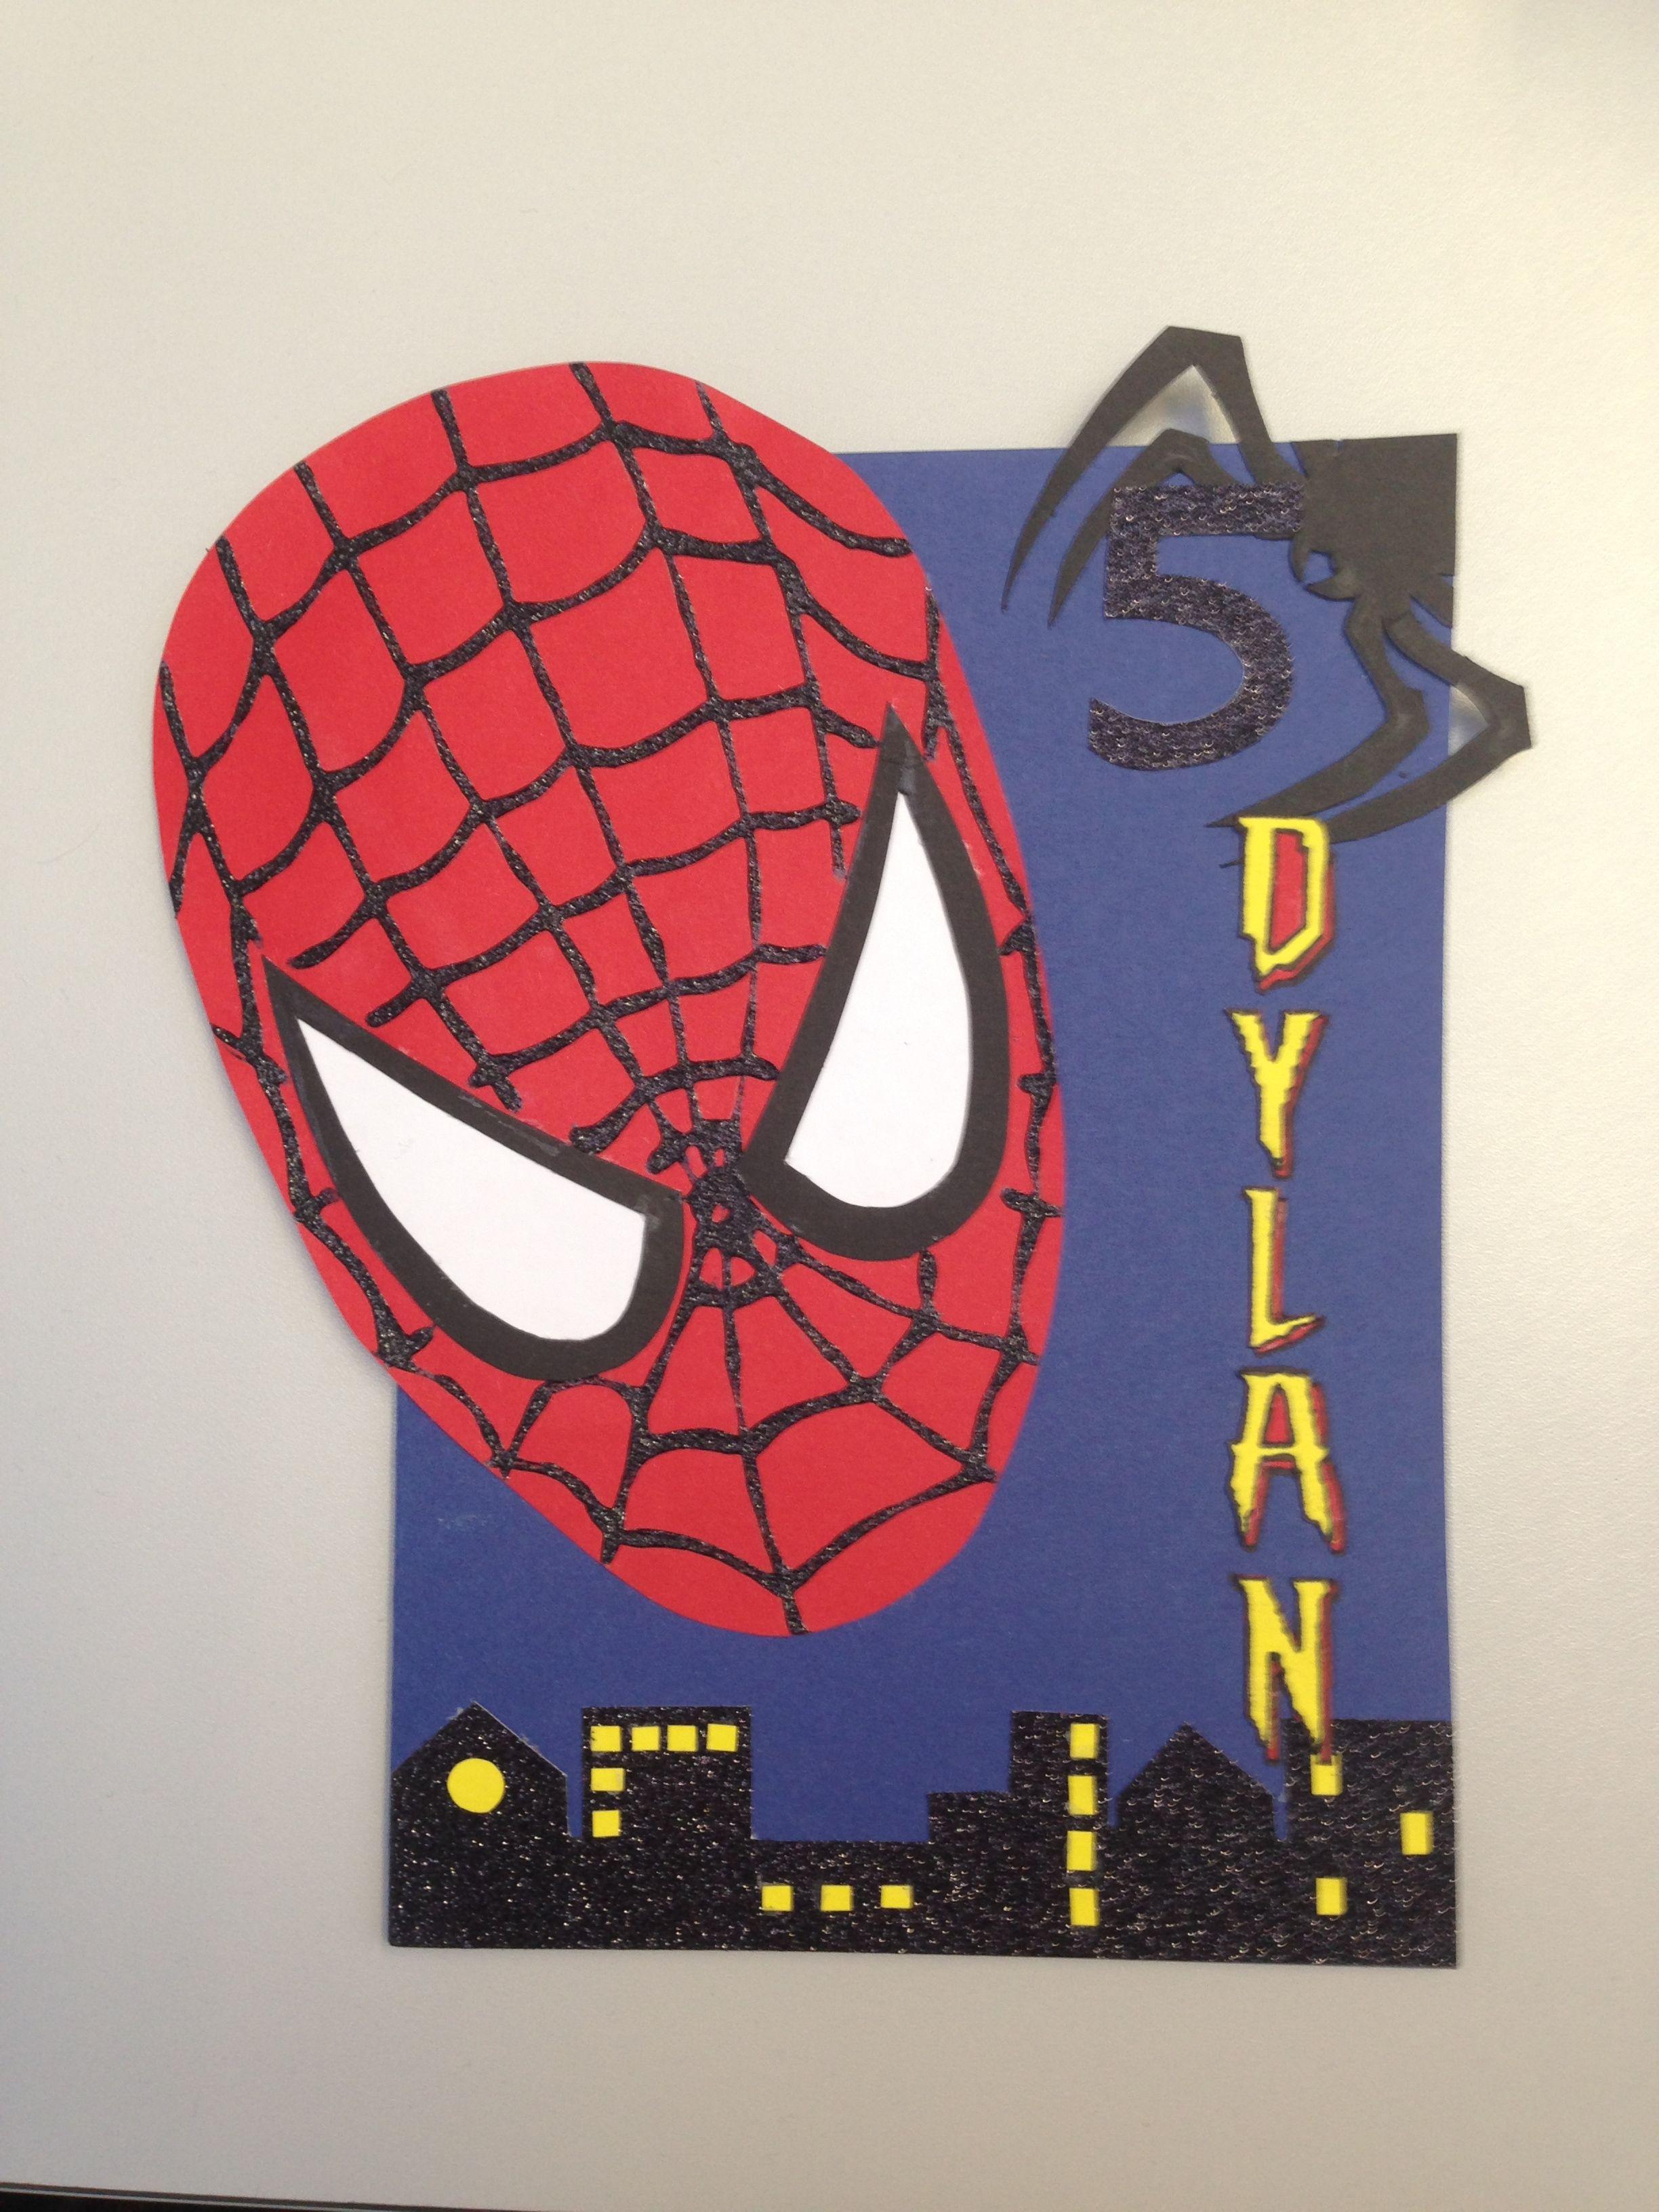 Pin By Serena Joseph On Children S Birthday Cards Special Birthday Cards Spiderman Cards Cricut Birthday Cards